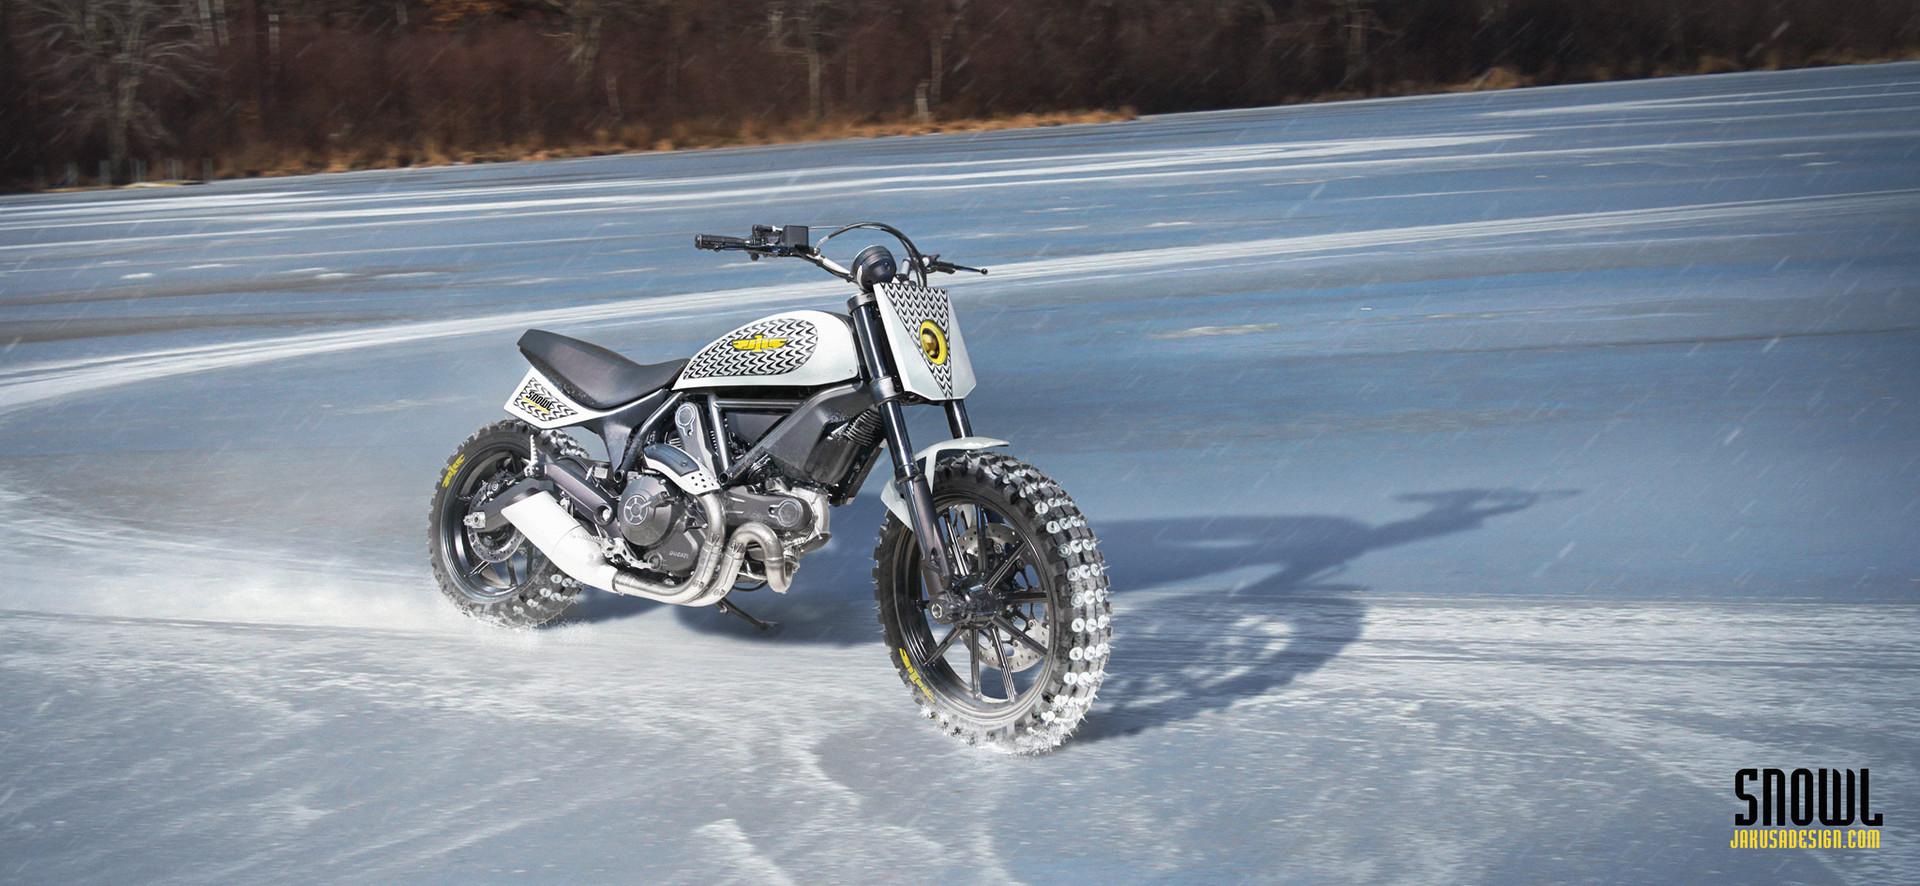 Tamas jakus snowl motorcycle 2048